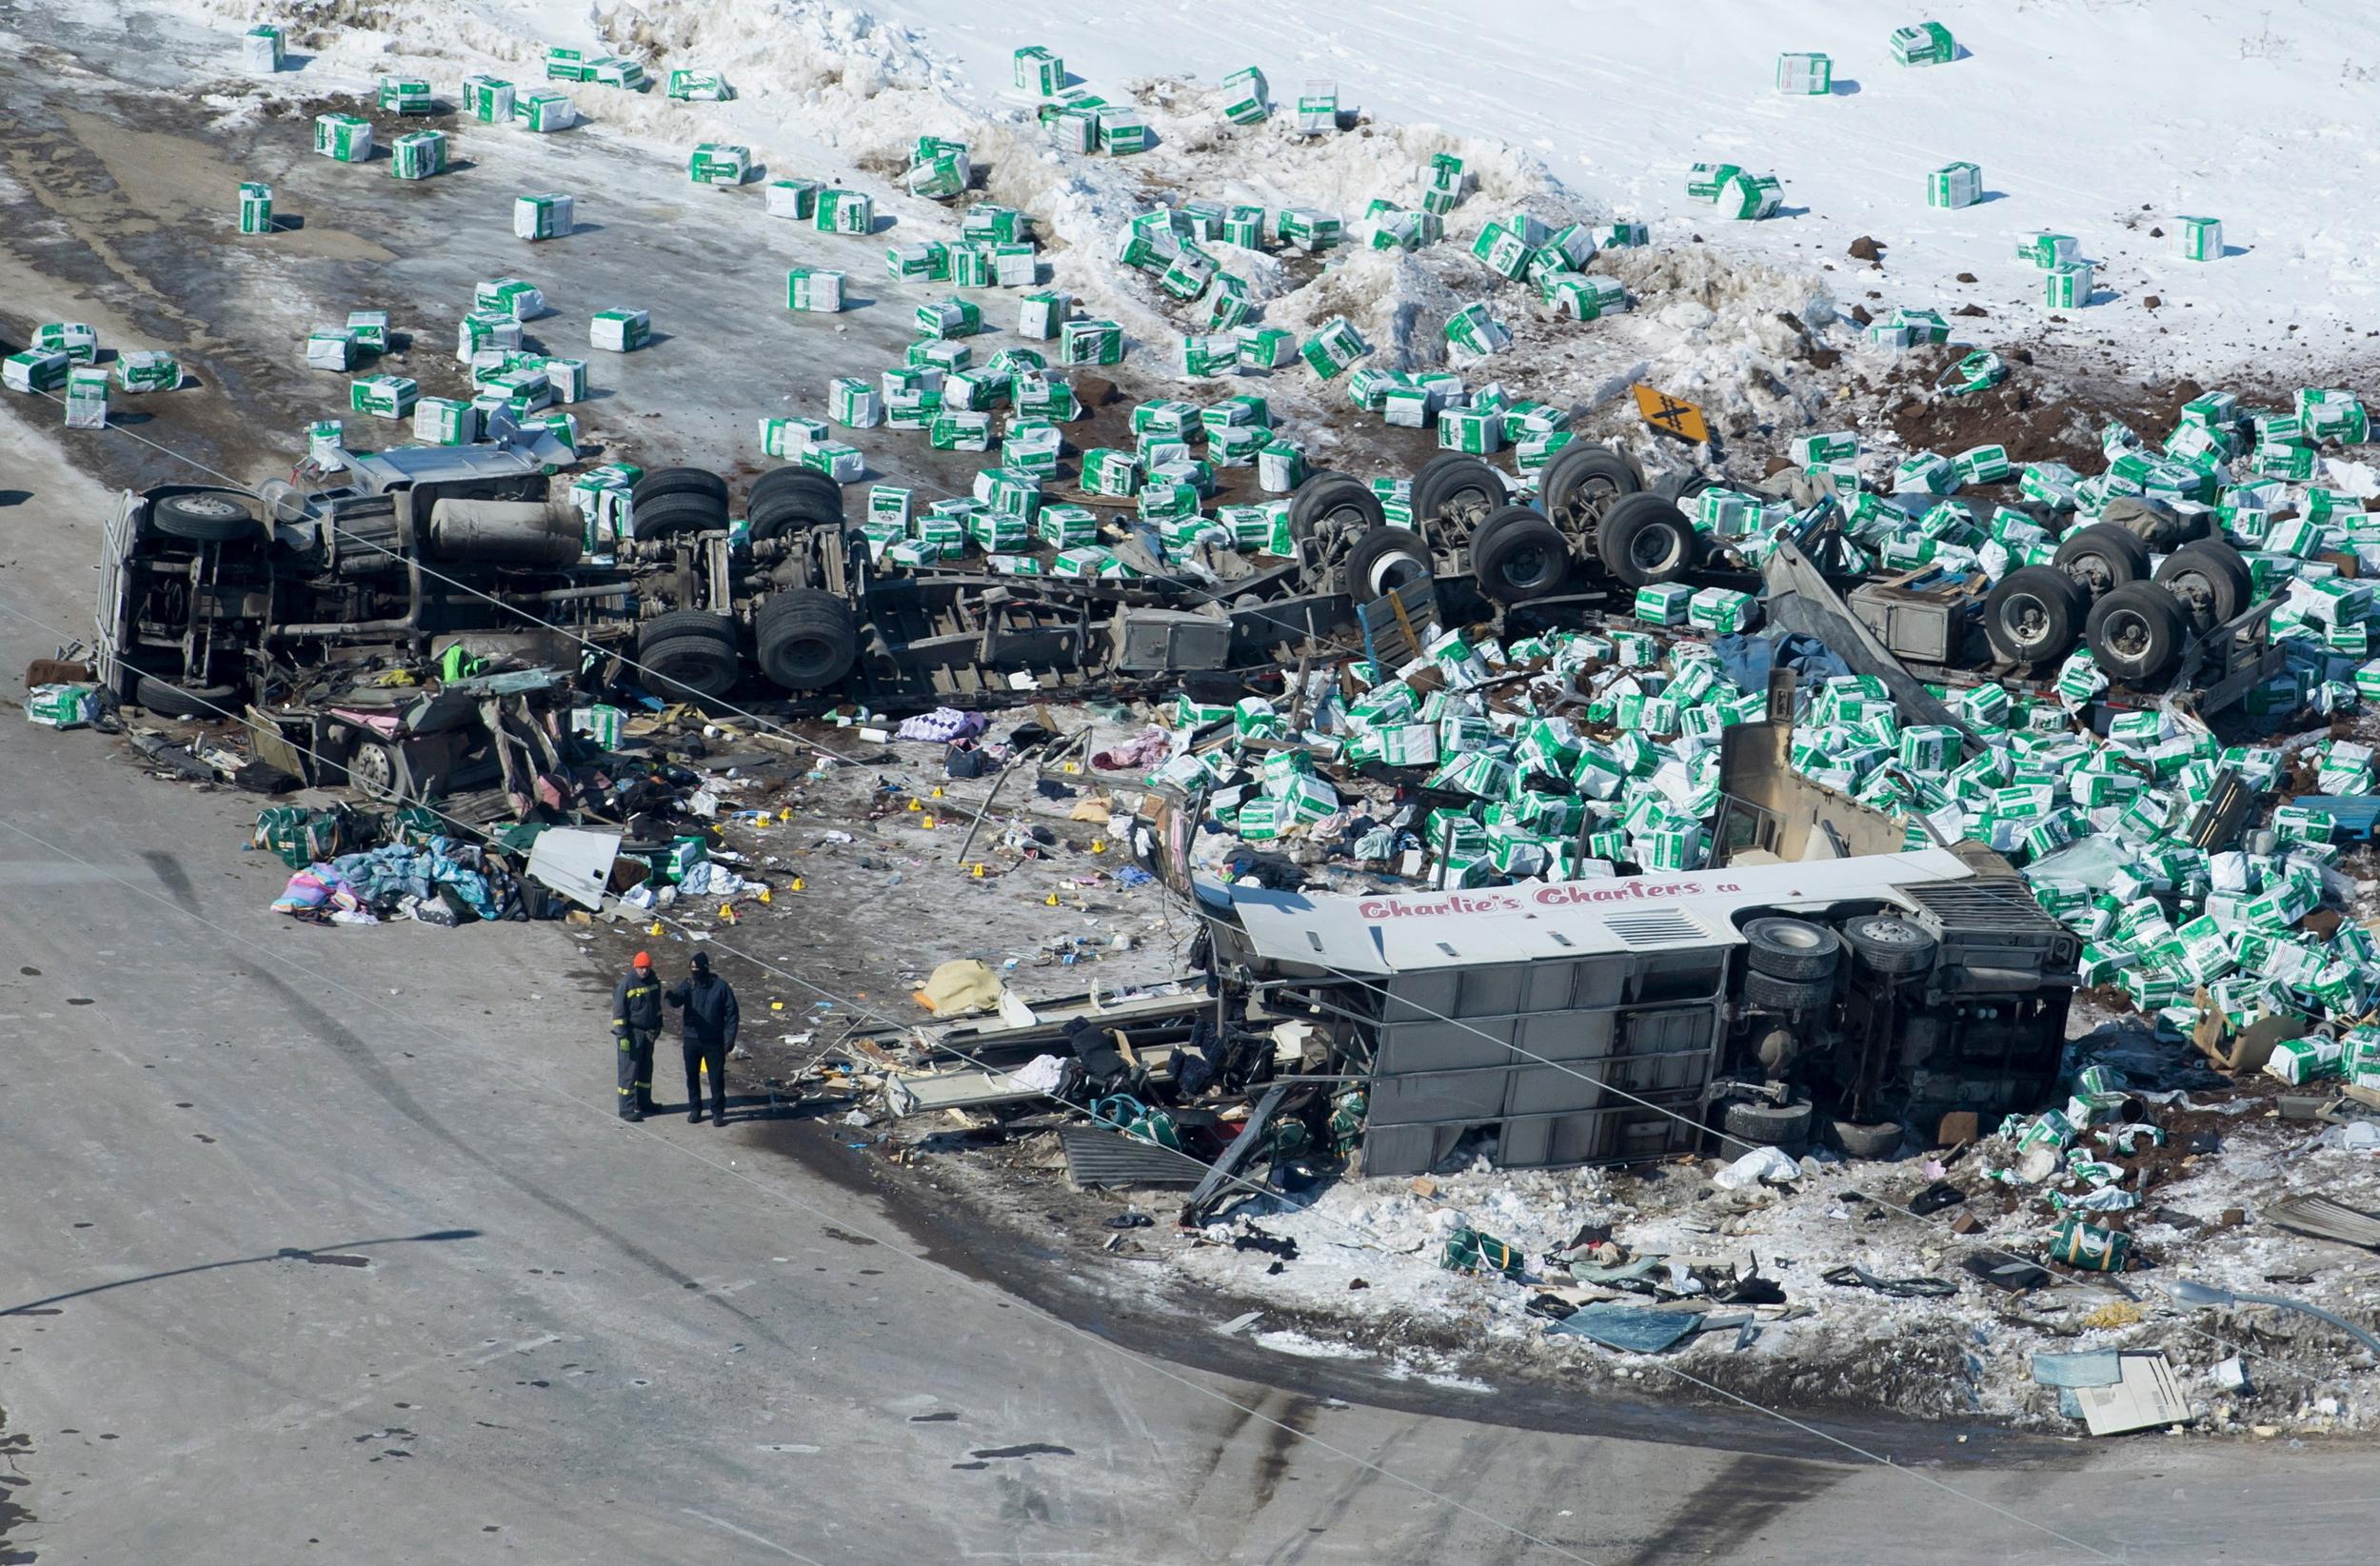 15 killed in bus crash involving Canadian junior hockey team police say